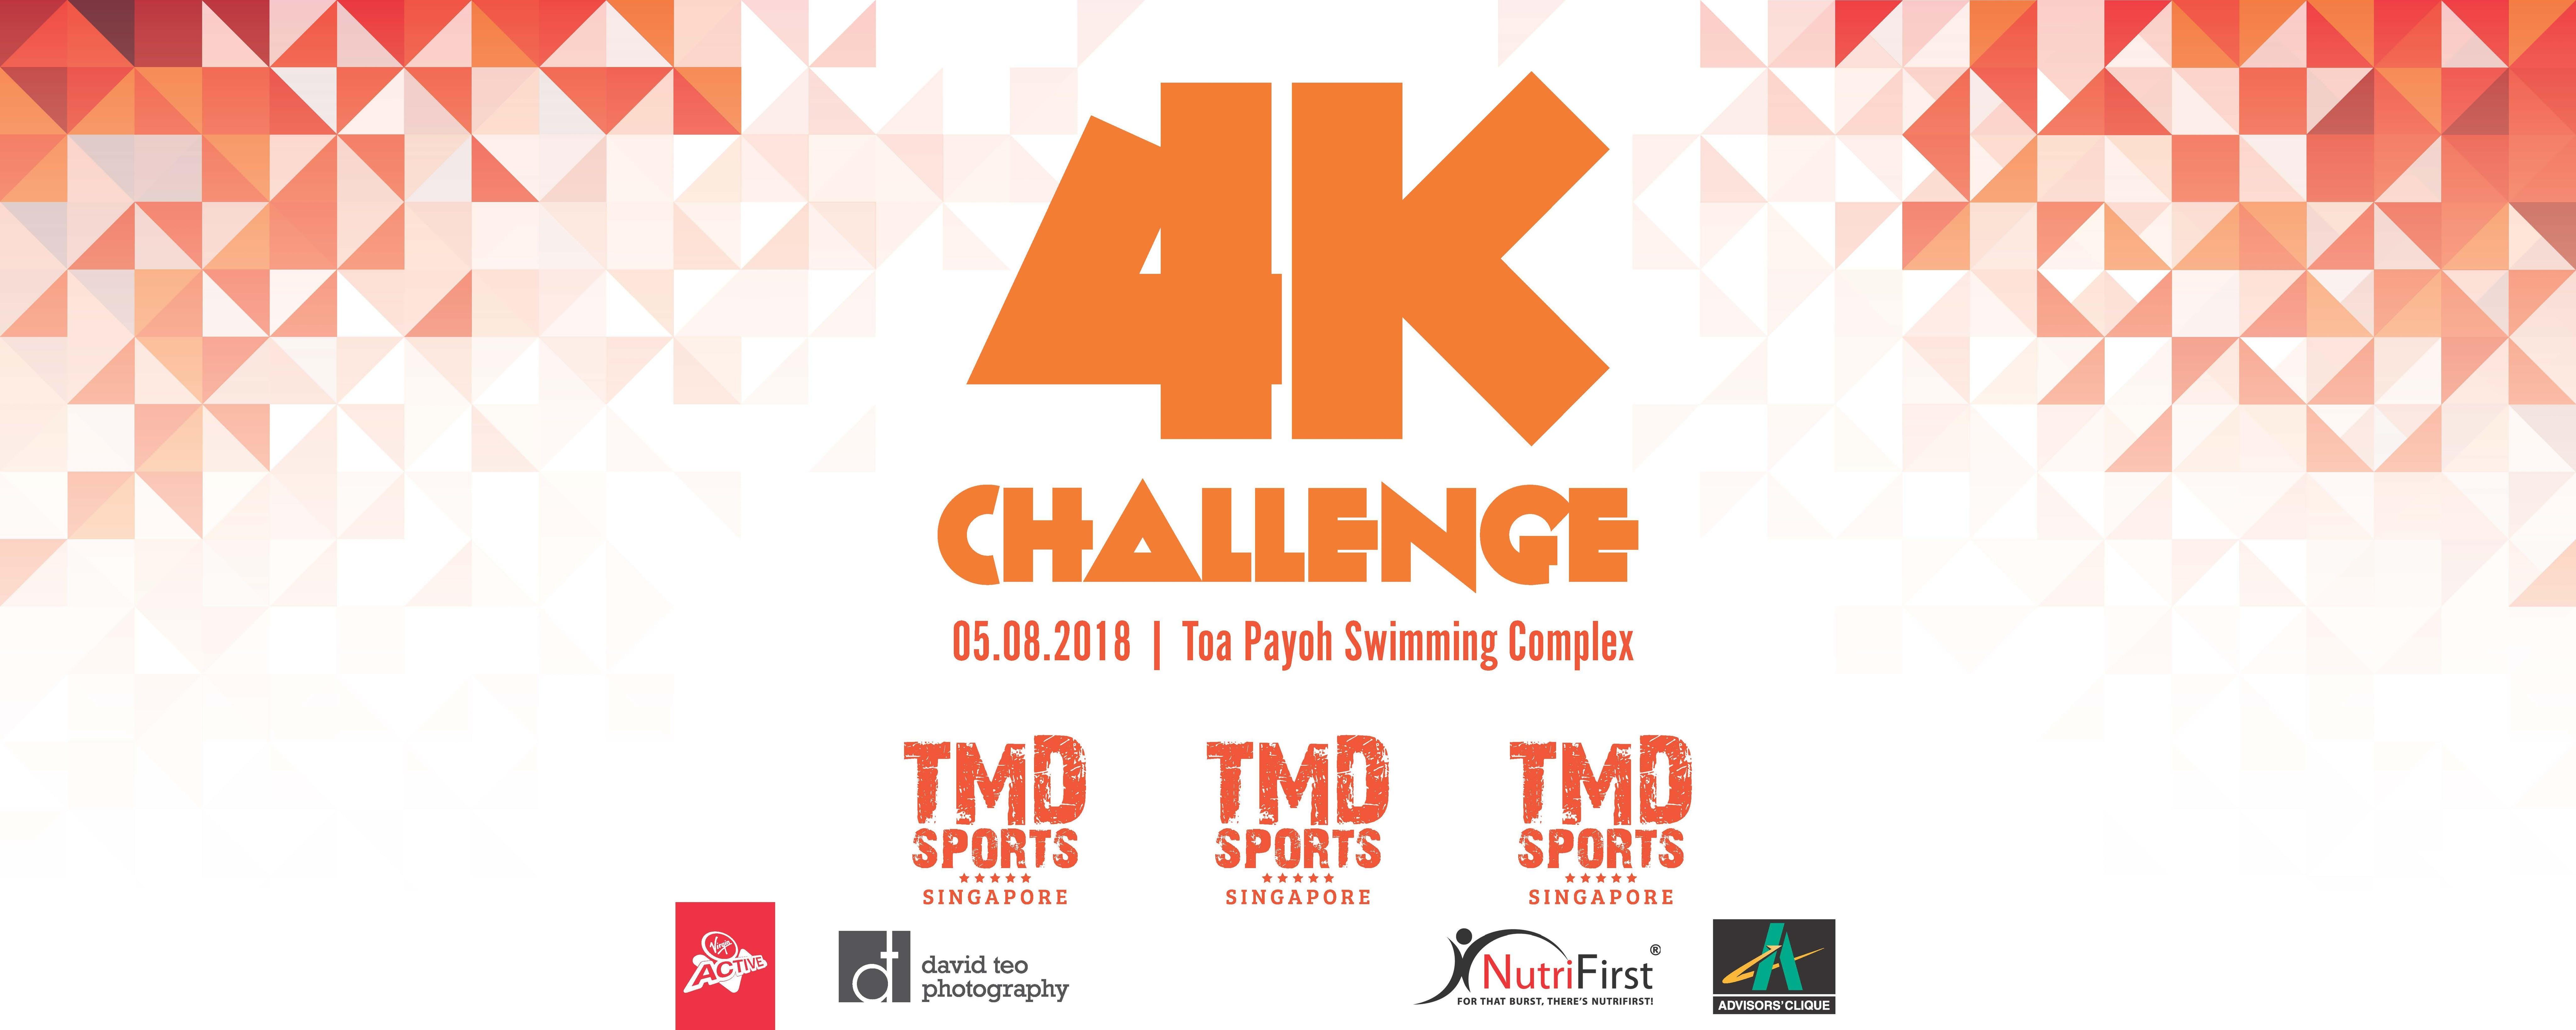 4K Challenge